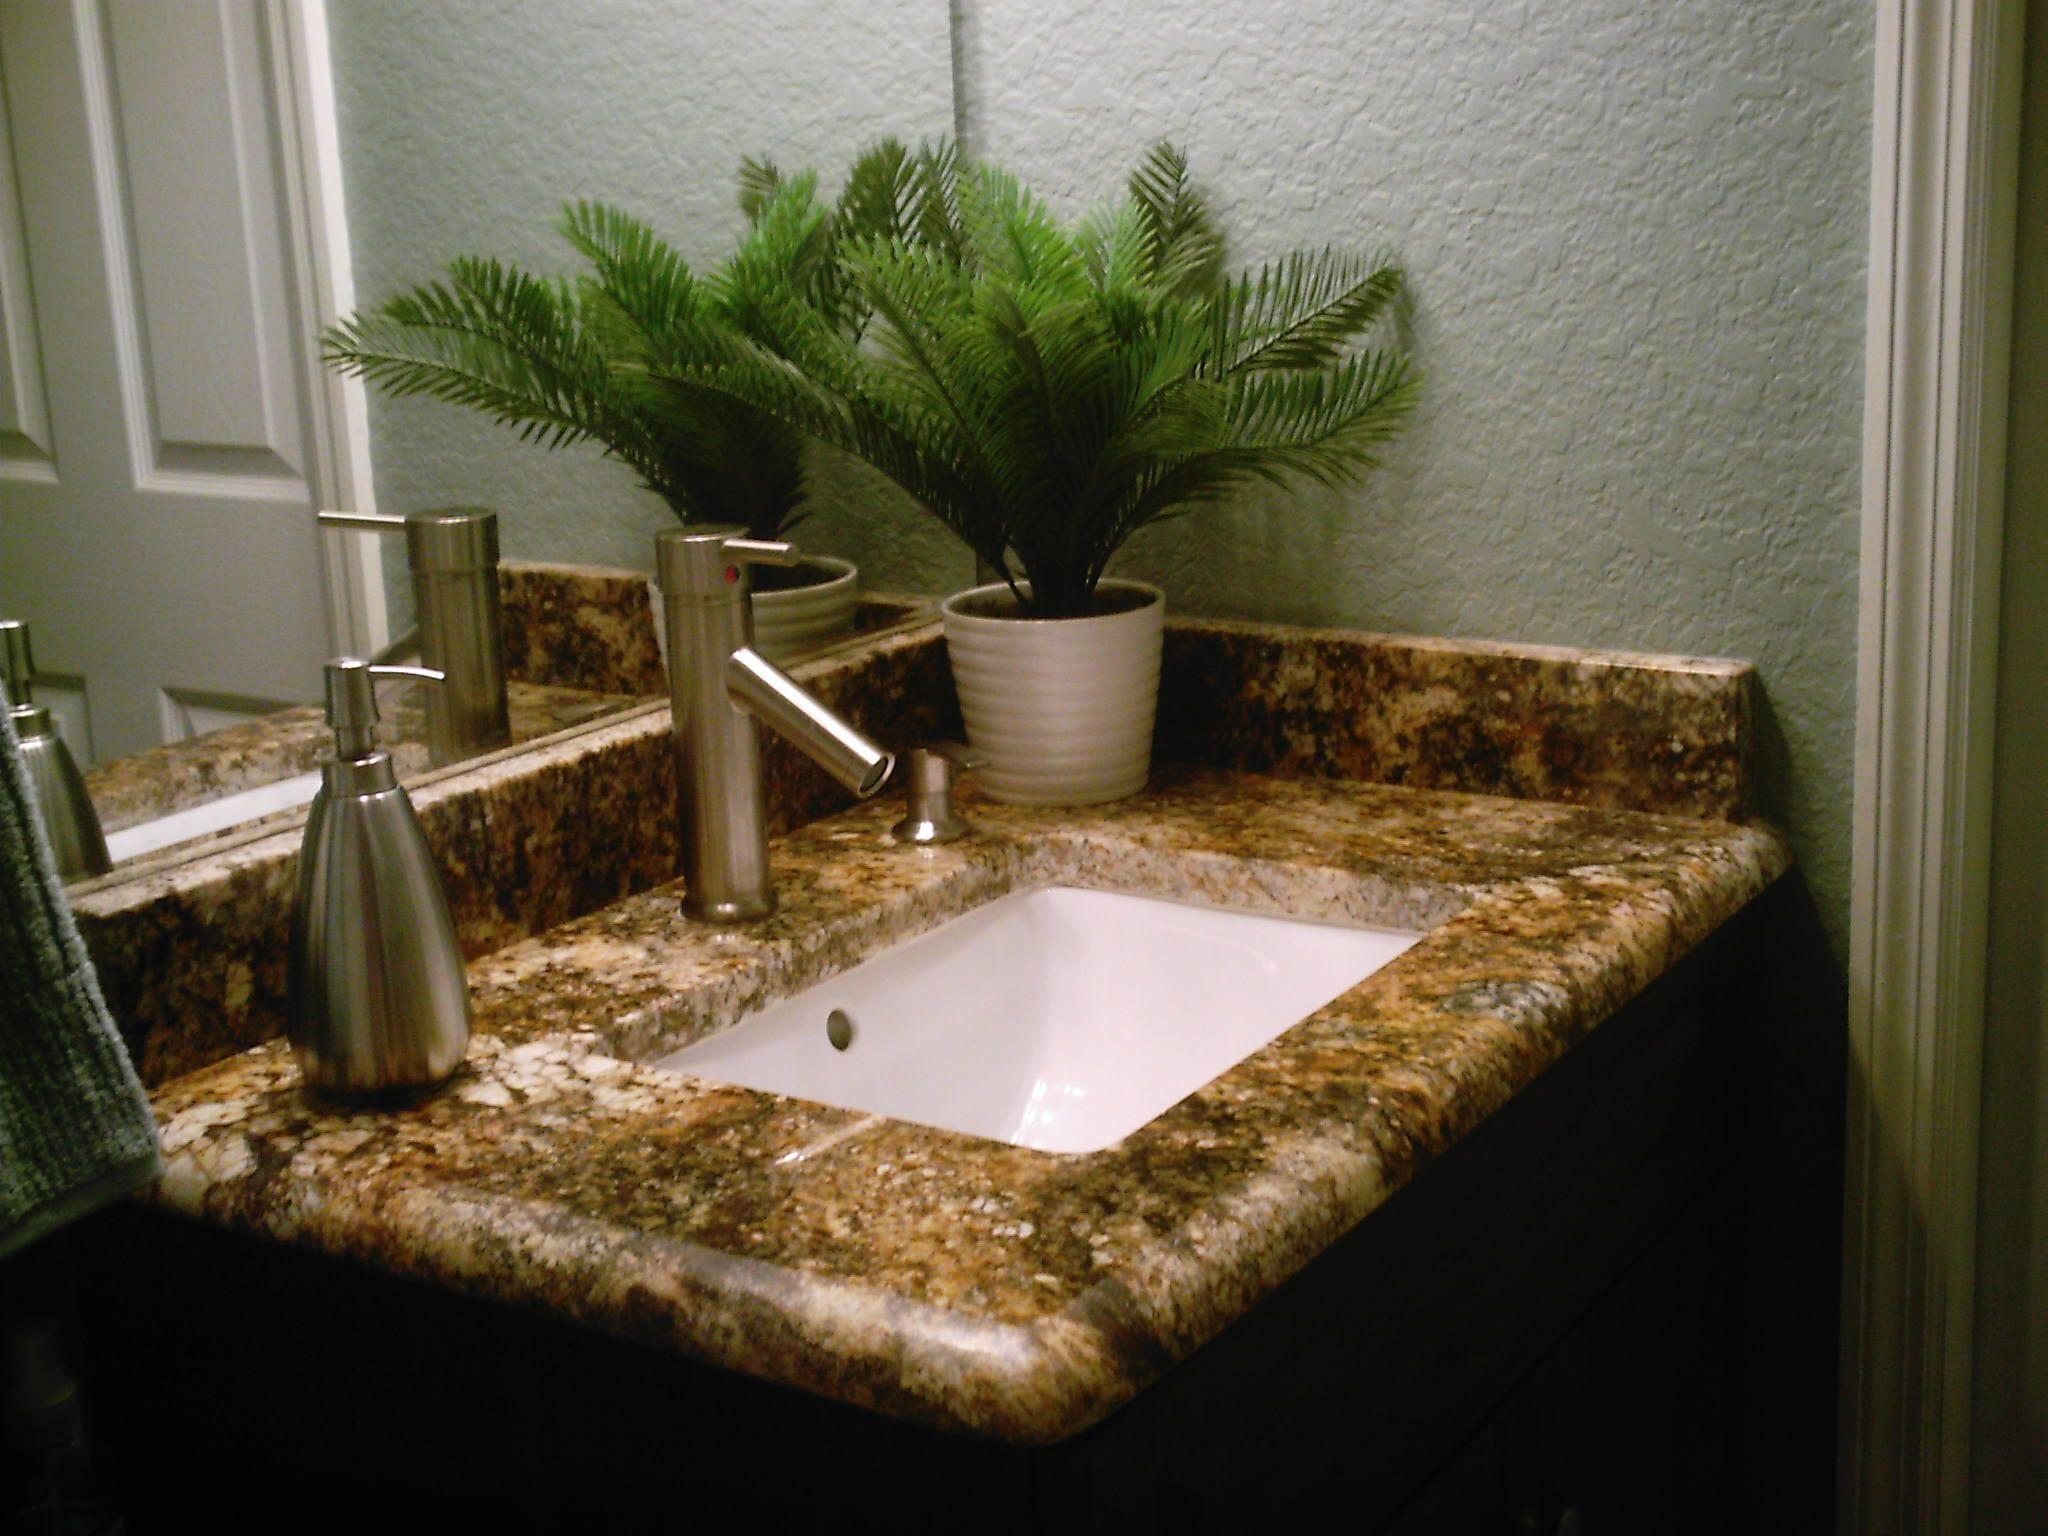 Brownmarblecountertopbathroomideassmalltileremodel - Faux marble bathroom countertops for bathroom decor ideas